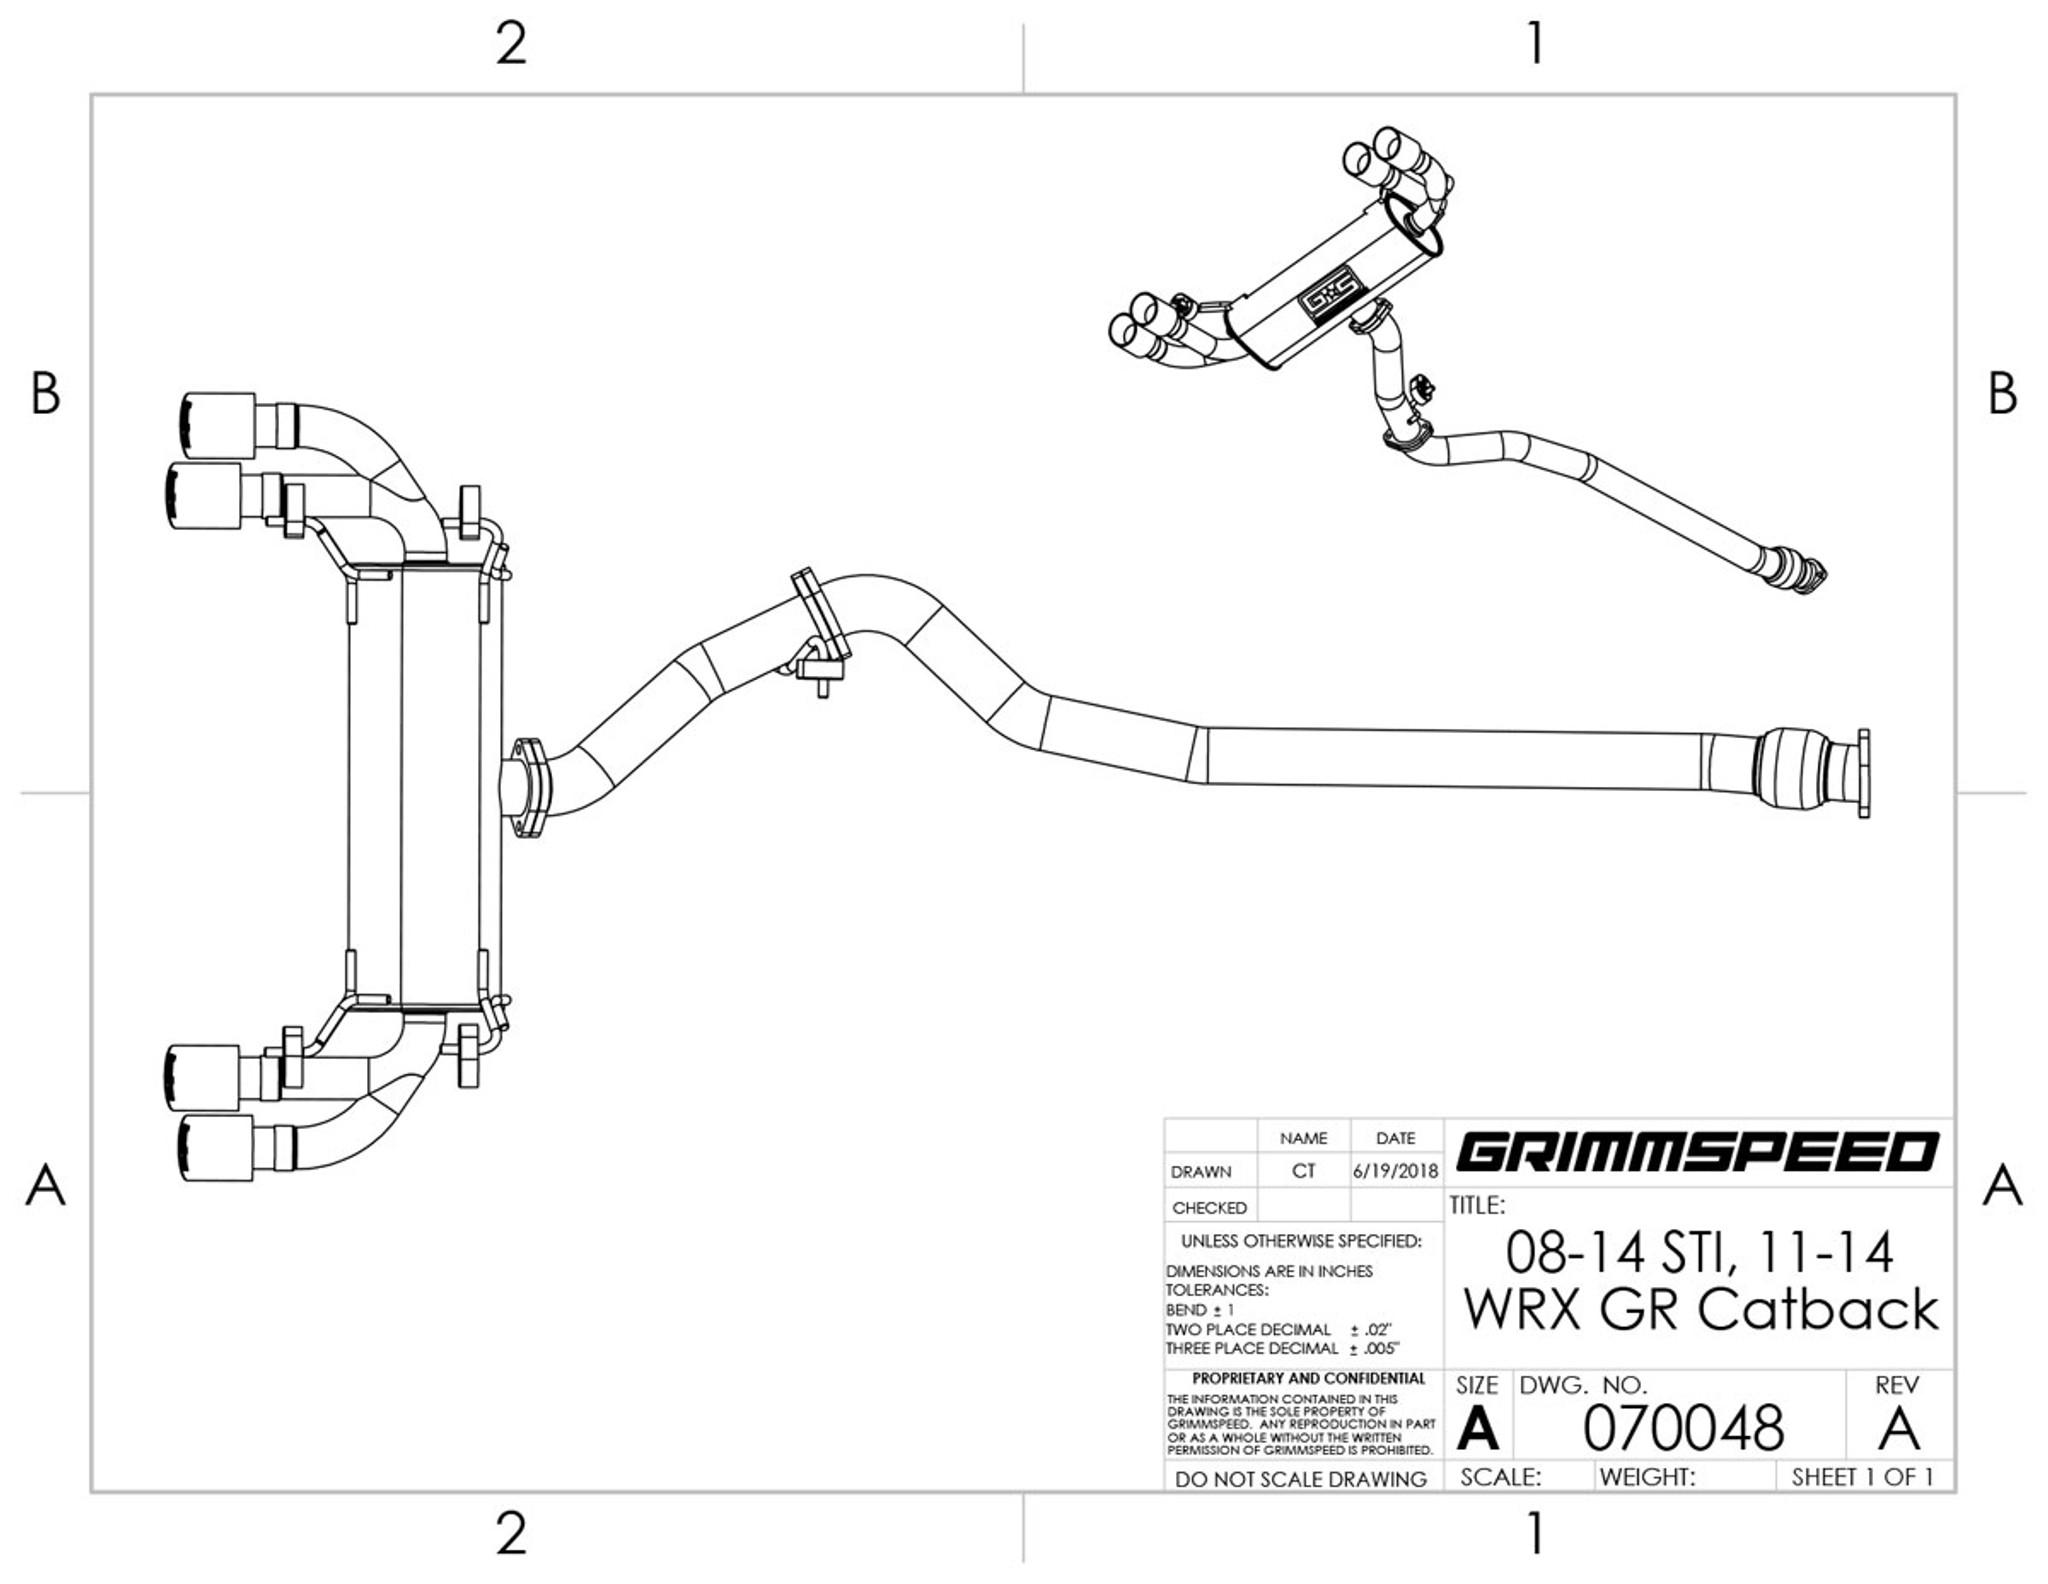 catback exhaust system resonated 11 14 wrx 08 14 sti hatchback